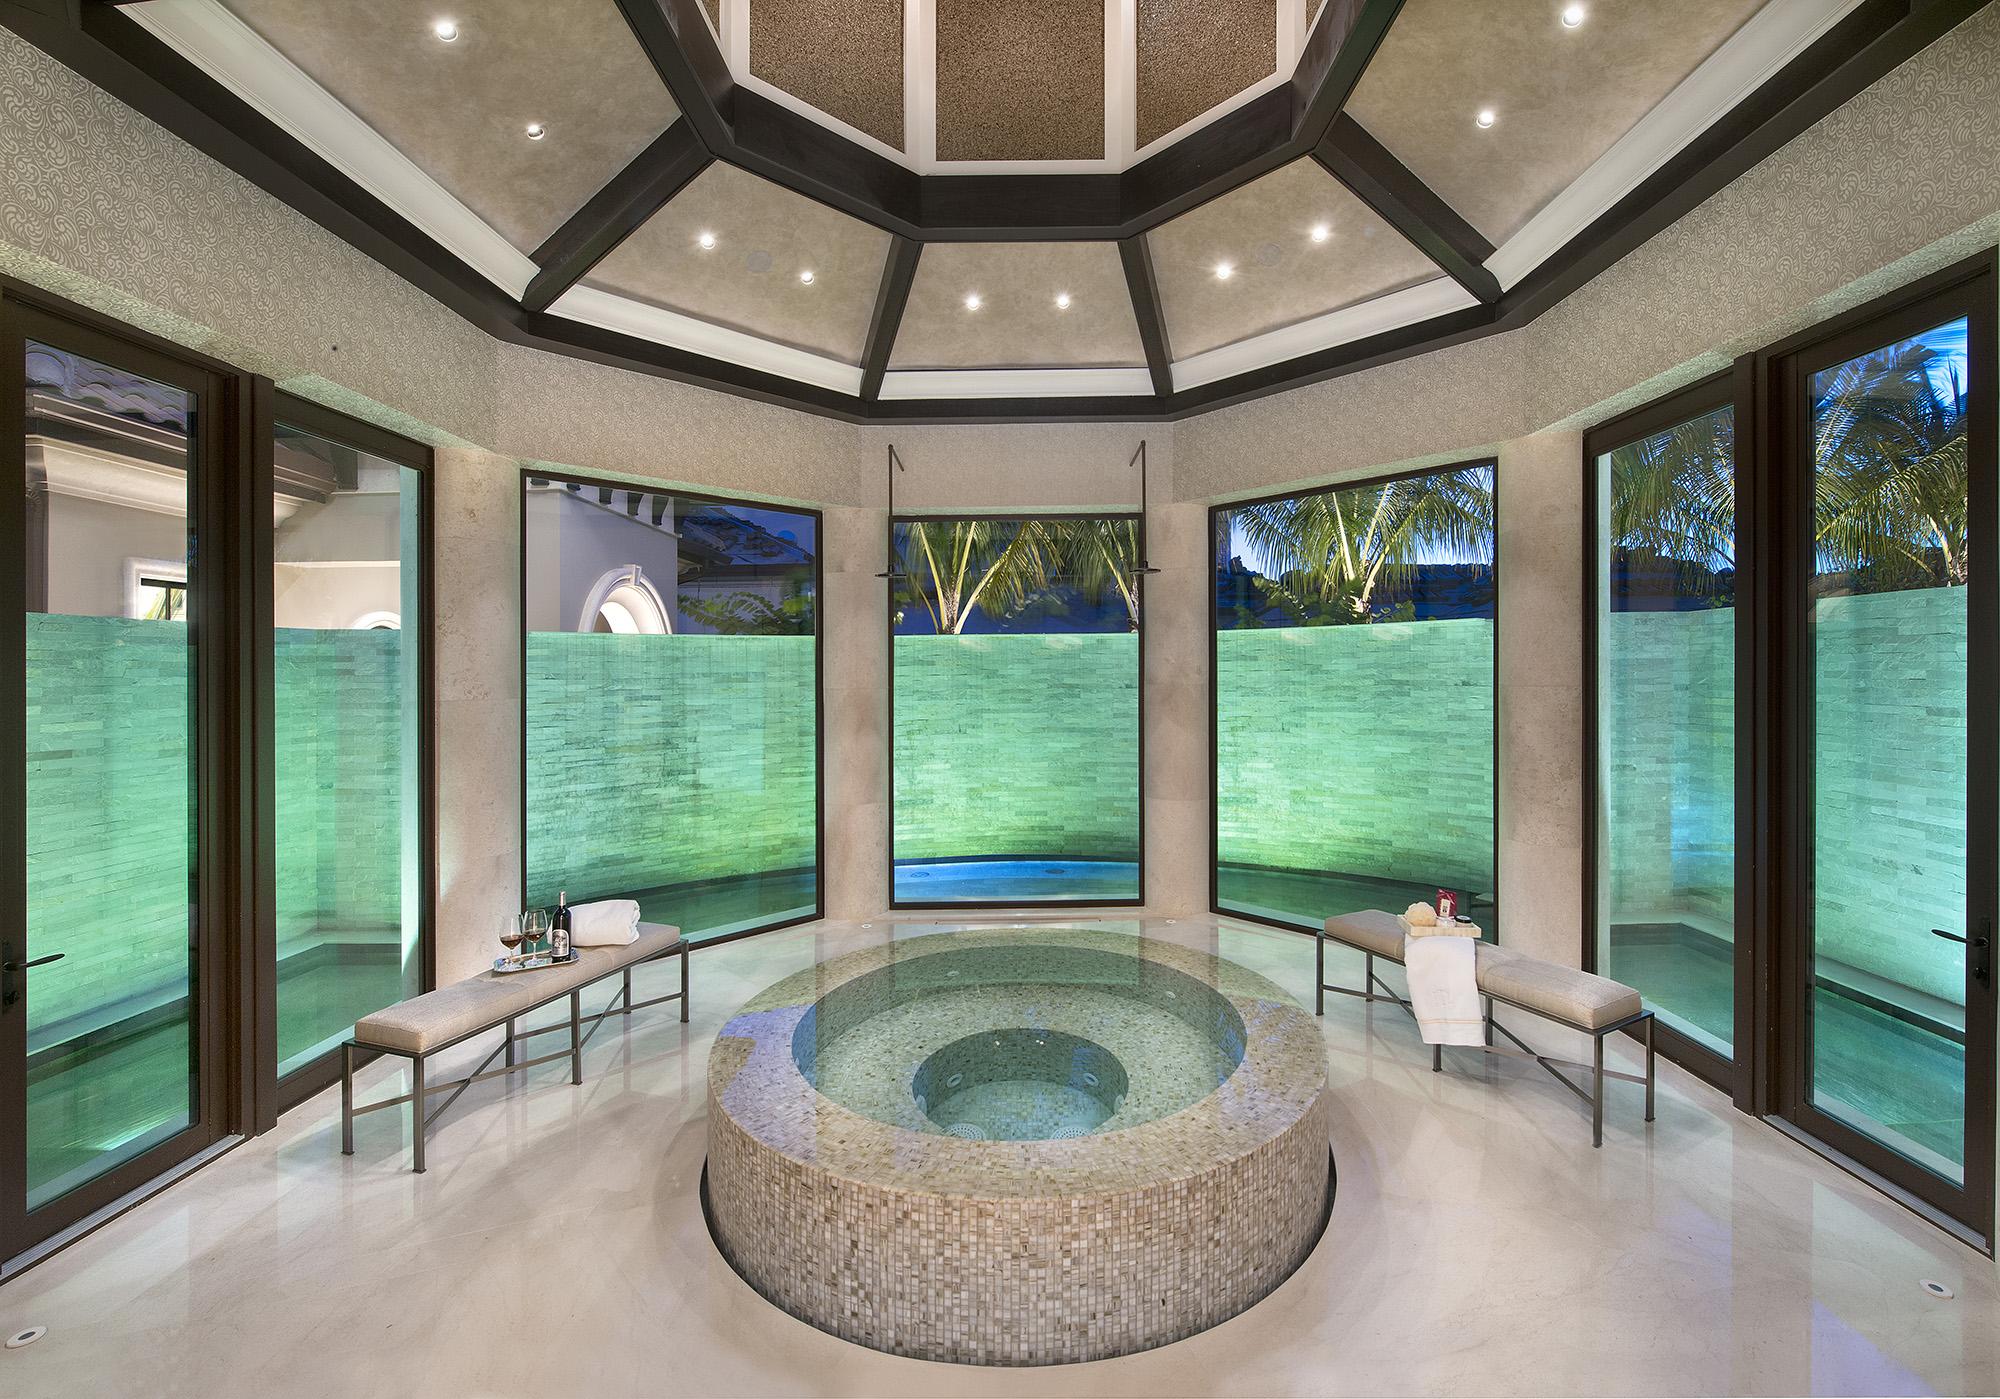 architect designs private spa area with hot tub.